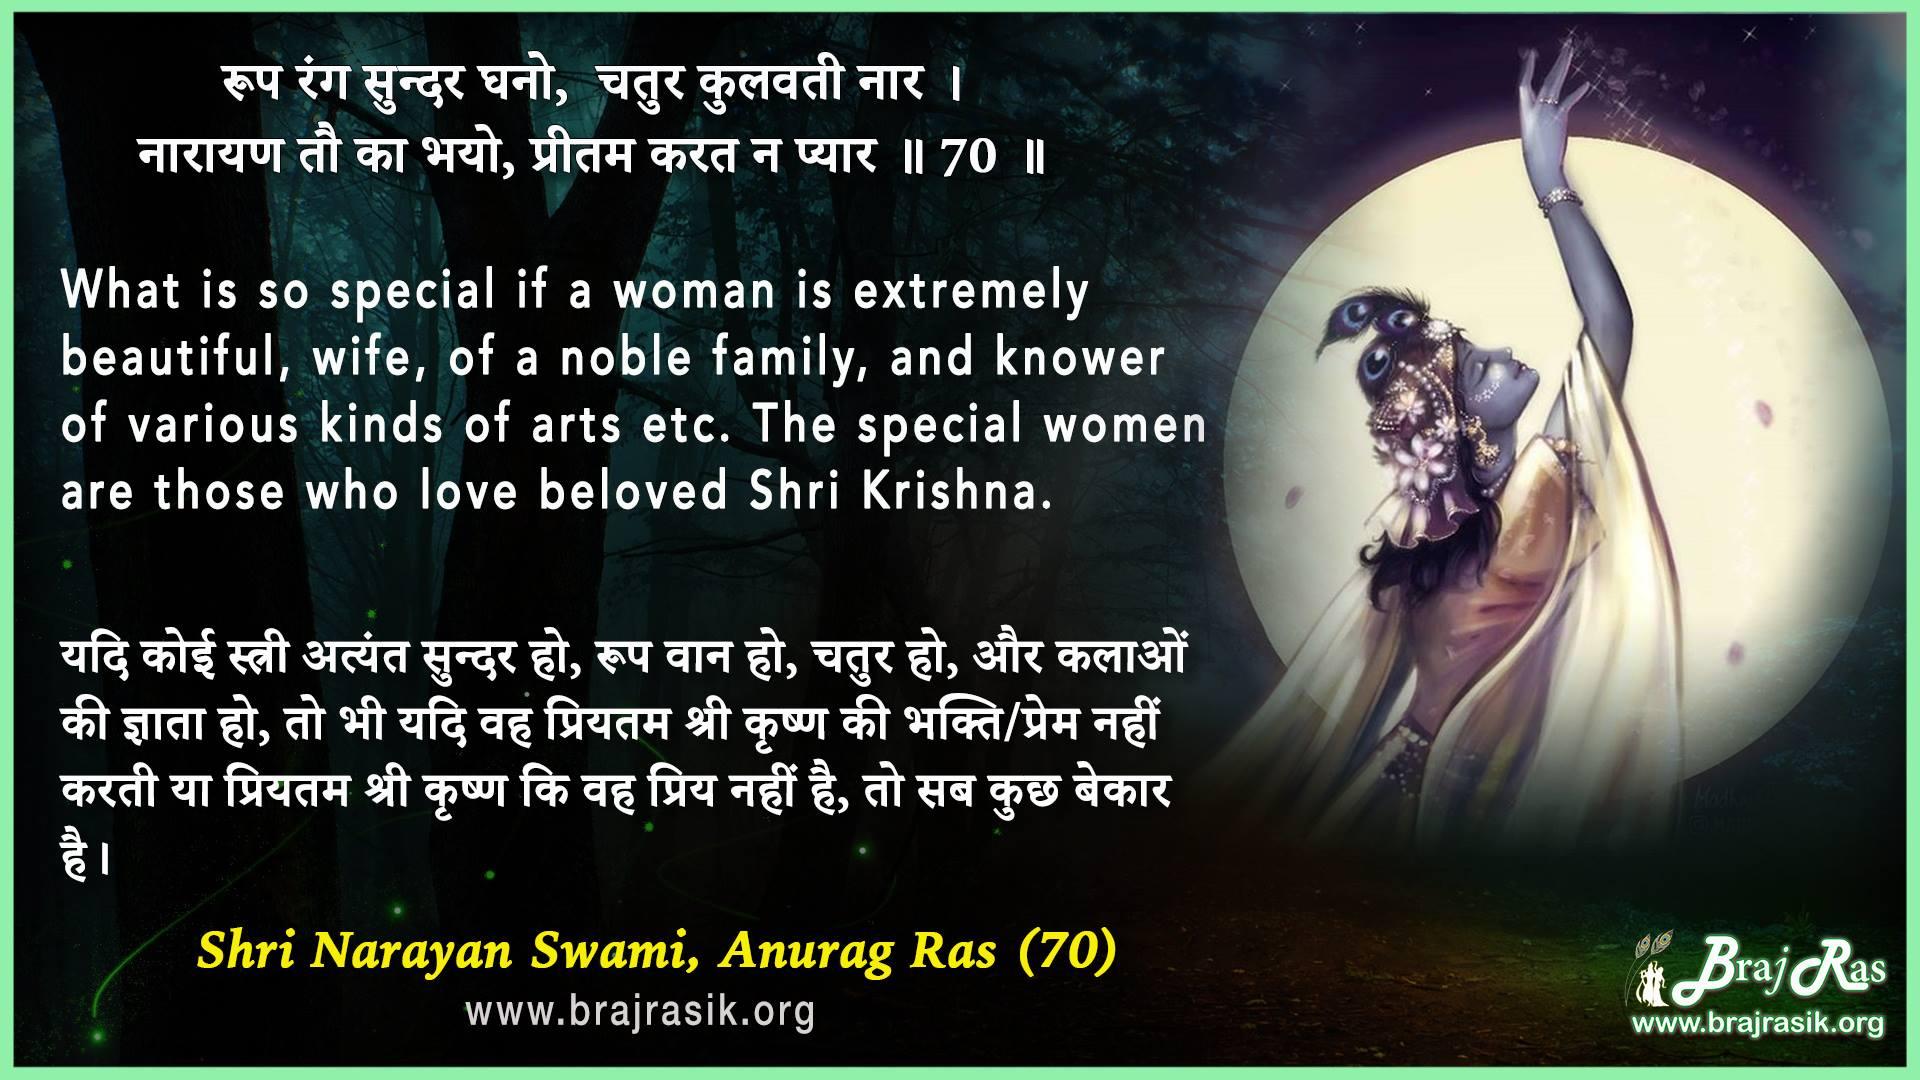 Roop Rang Sundar Ghano, Chatur Kulvati Naar - Shri Narayan Swami, Anurag Ras (70)